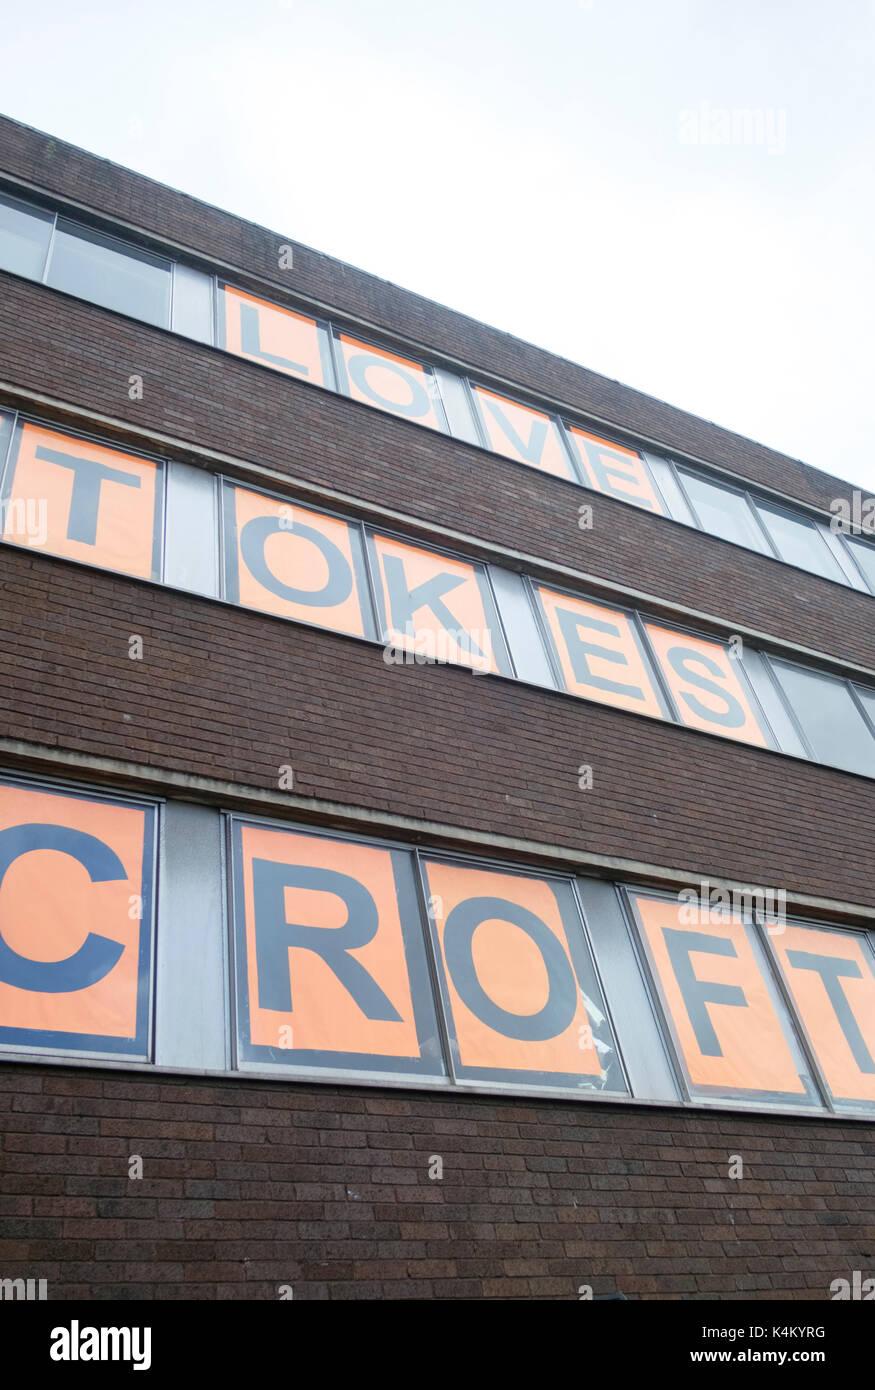 Around Stokes croft Bristol england EUK - Stock Image